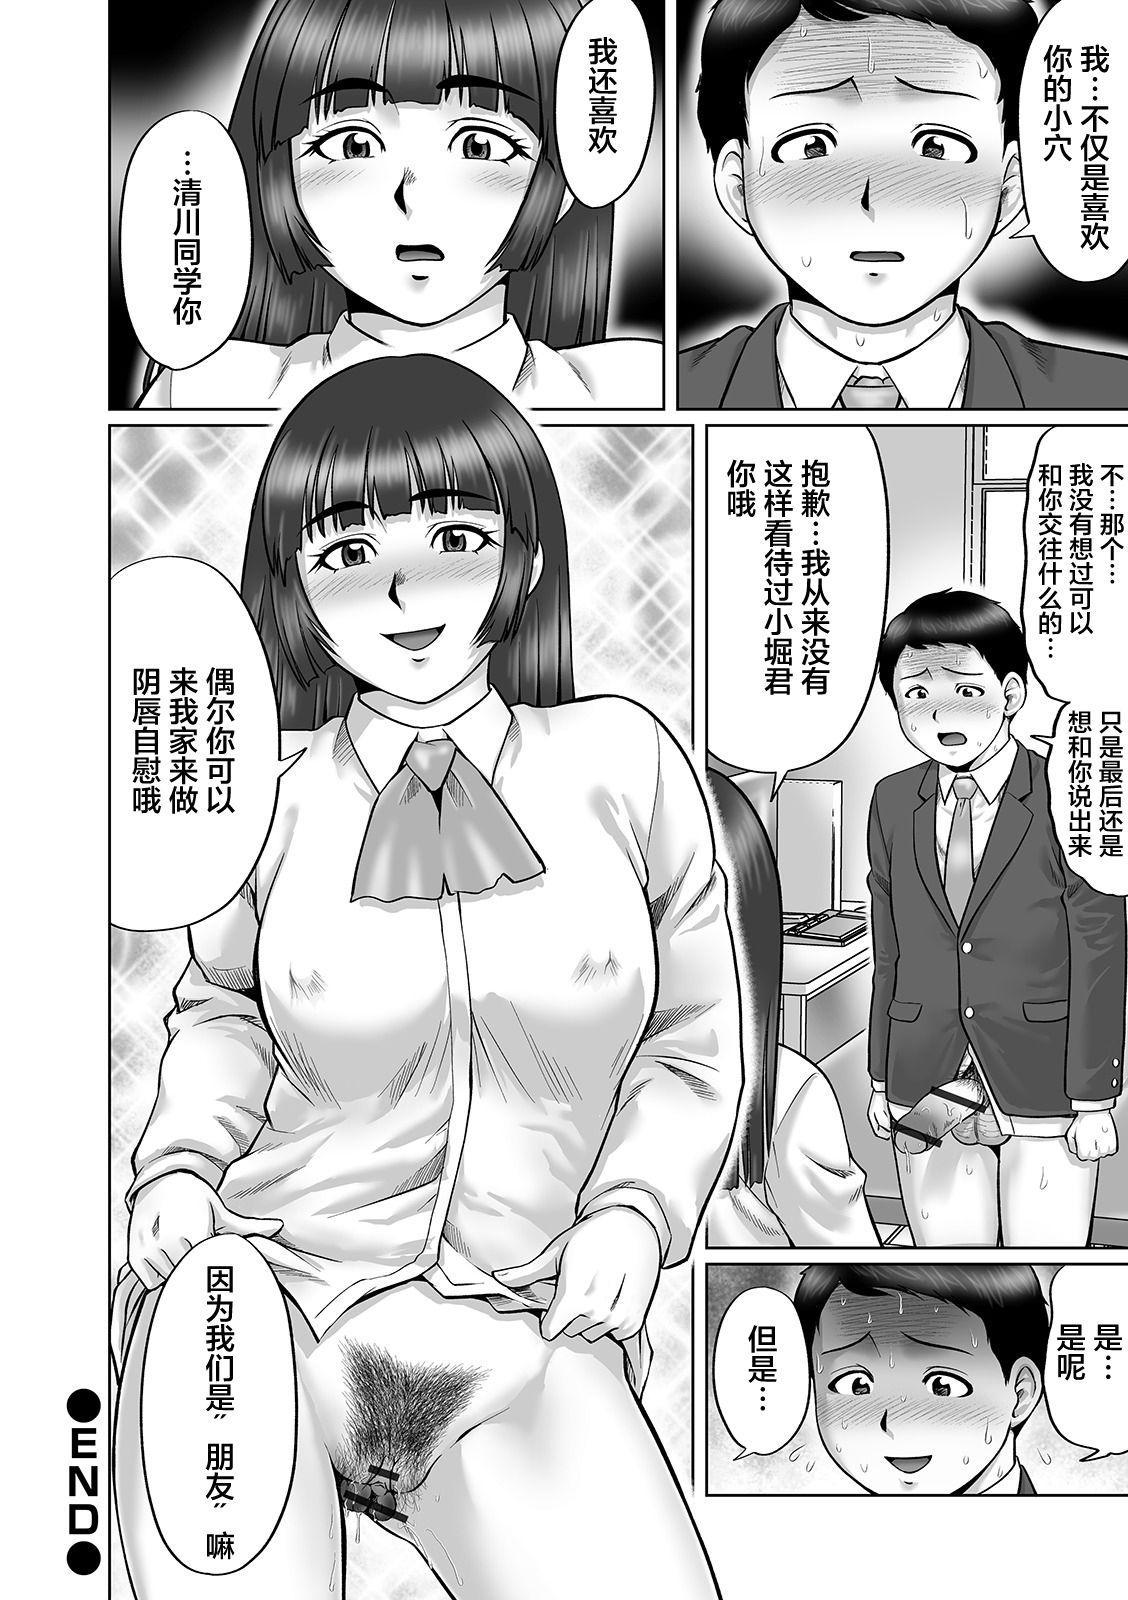 Sonna Tomodachi 25